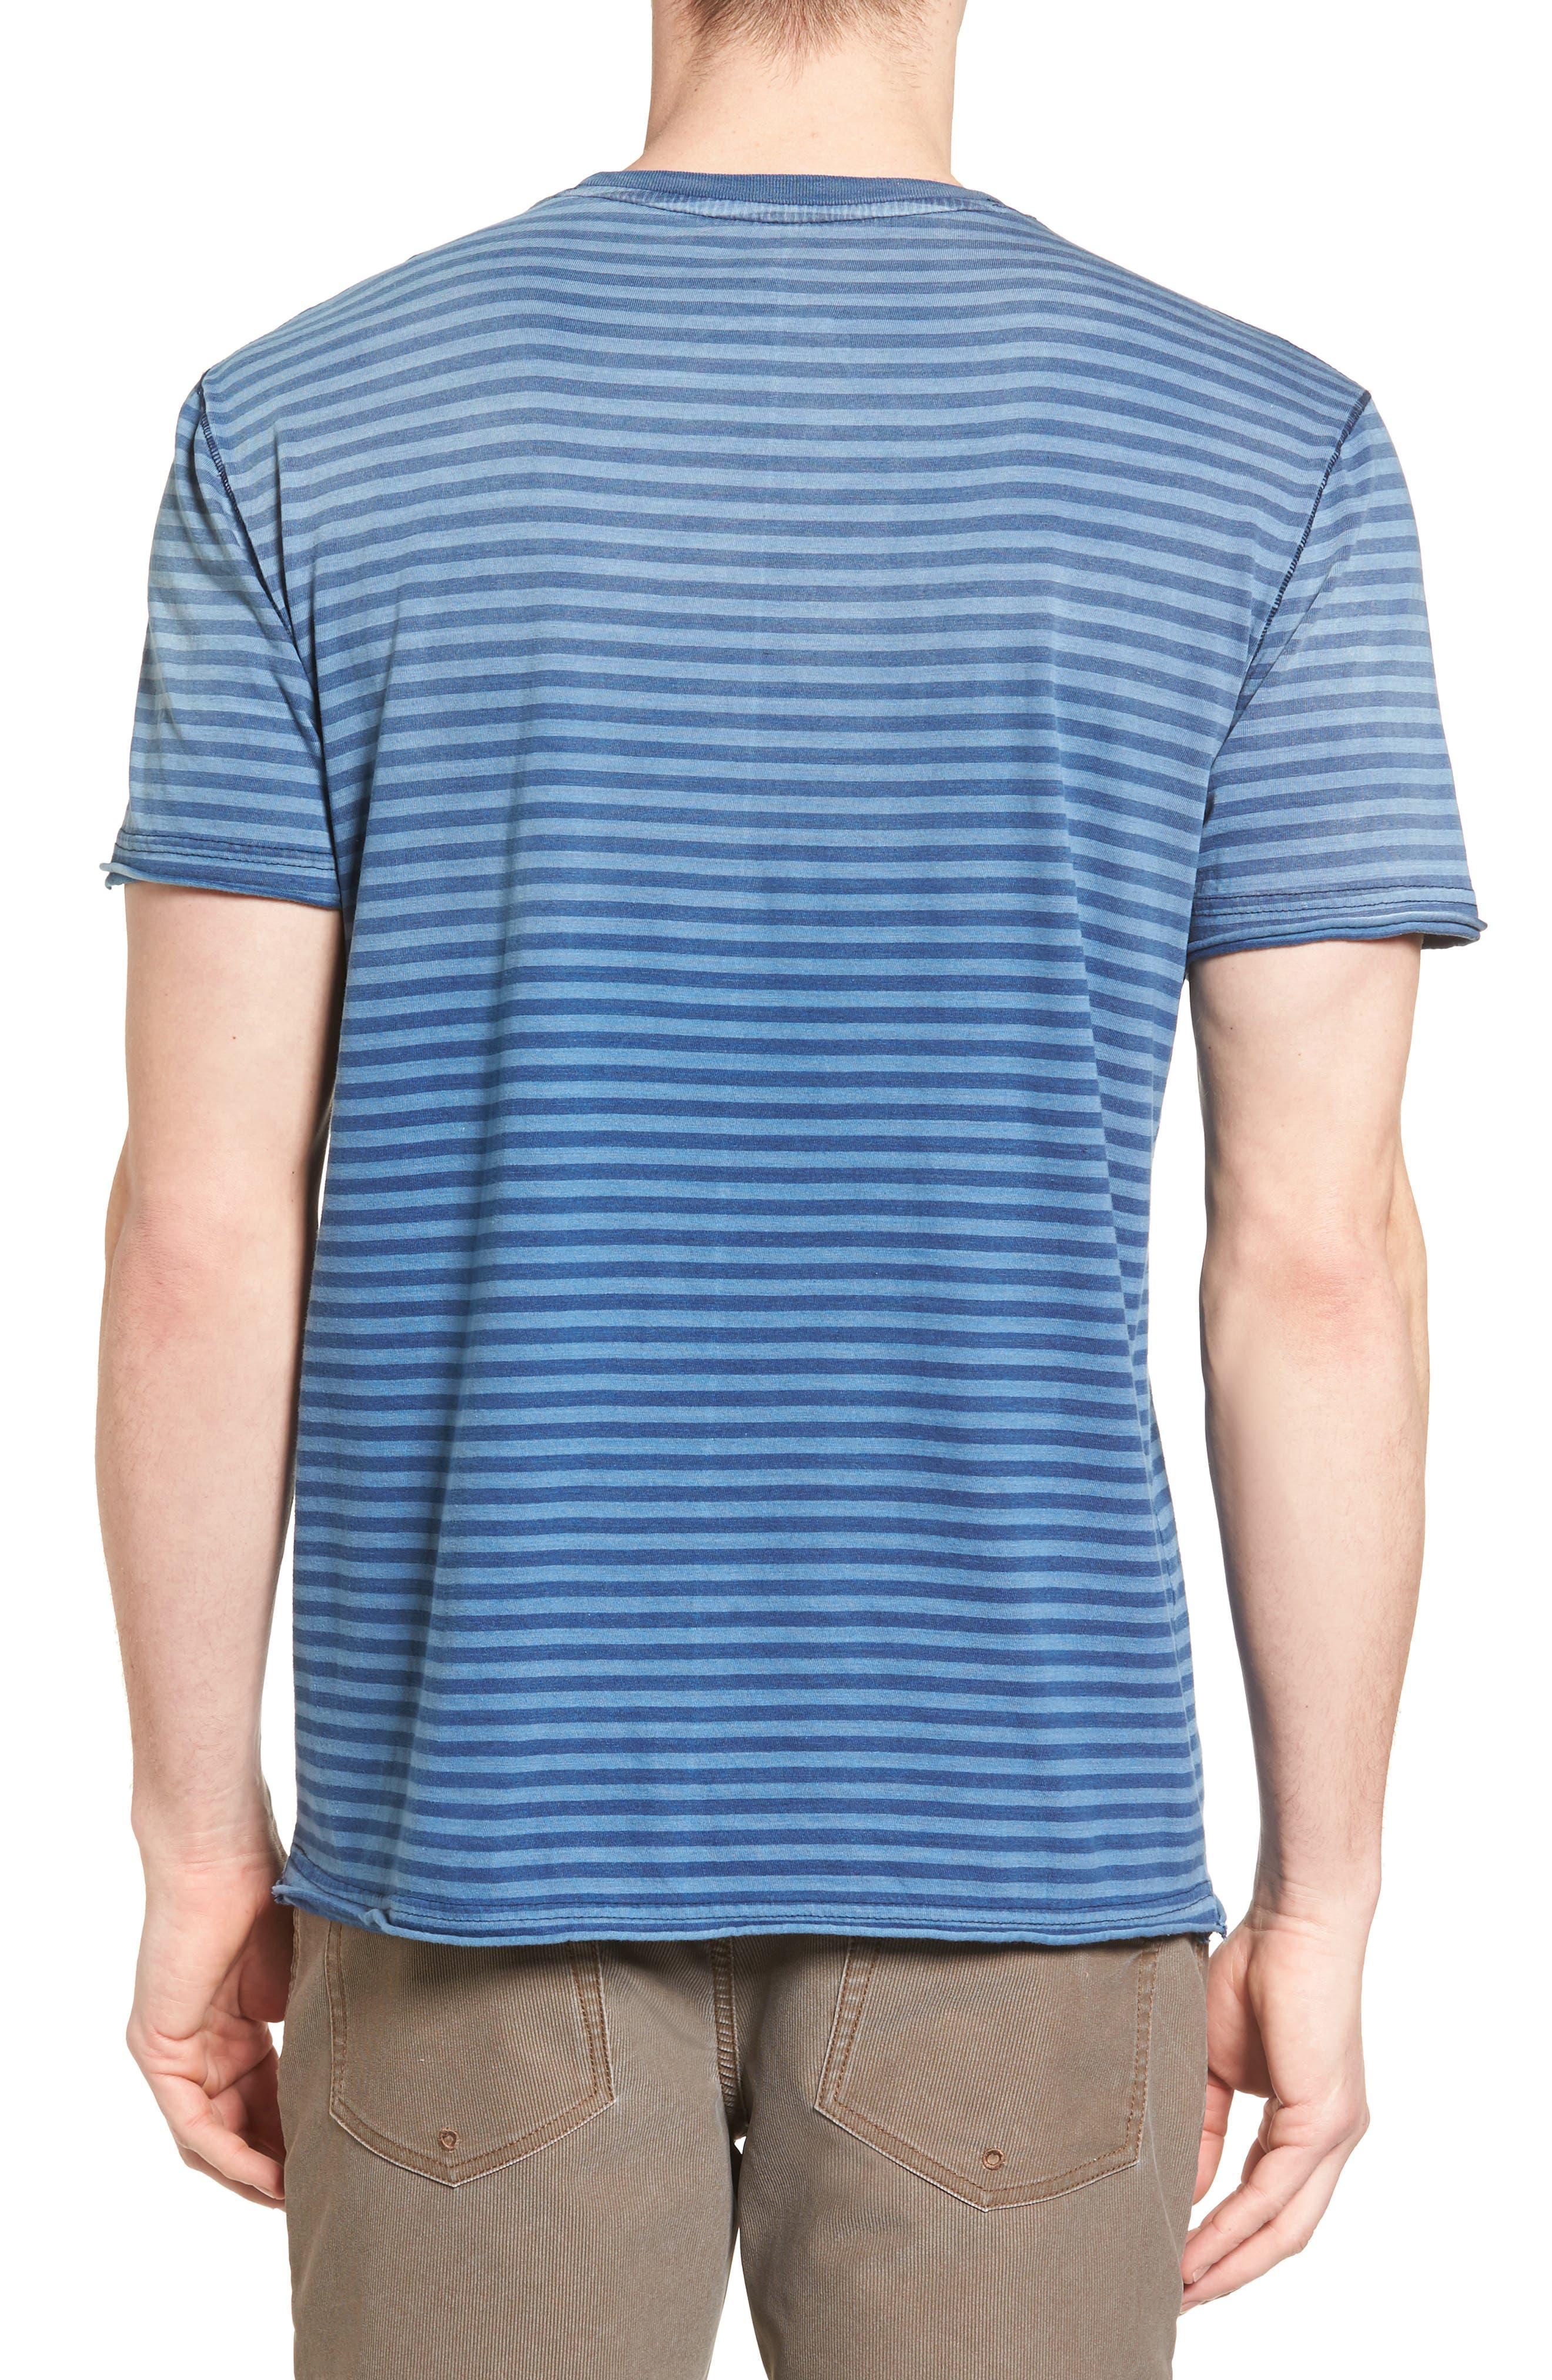 Alternate Image 2  - Gramicci Take It Slow T-Shirt